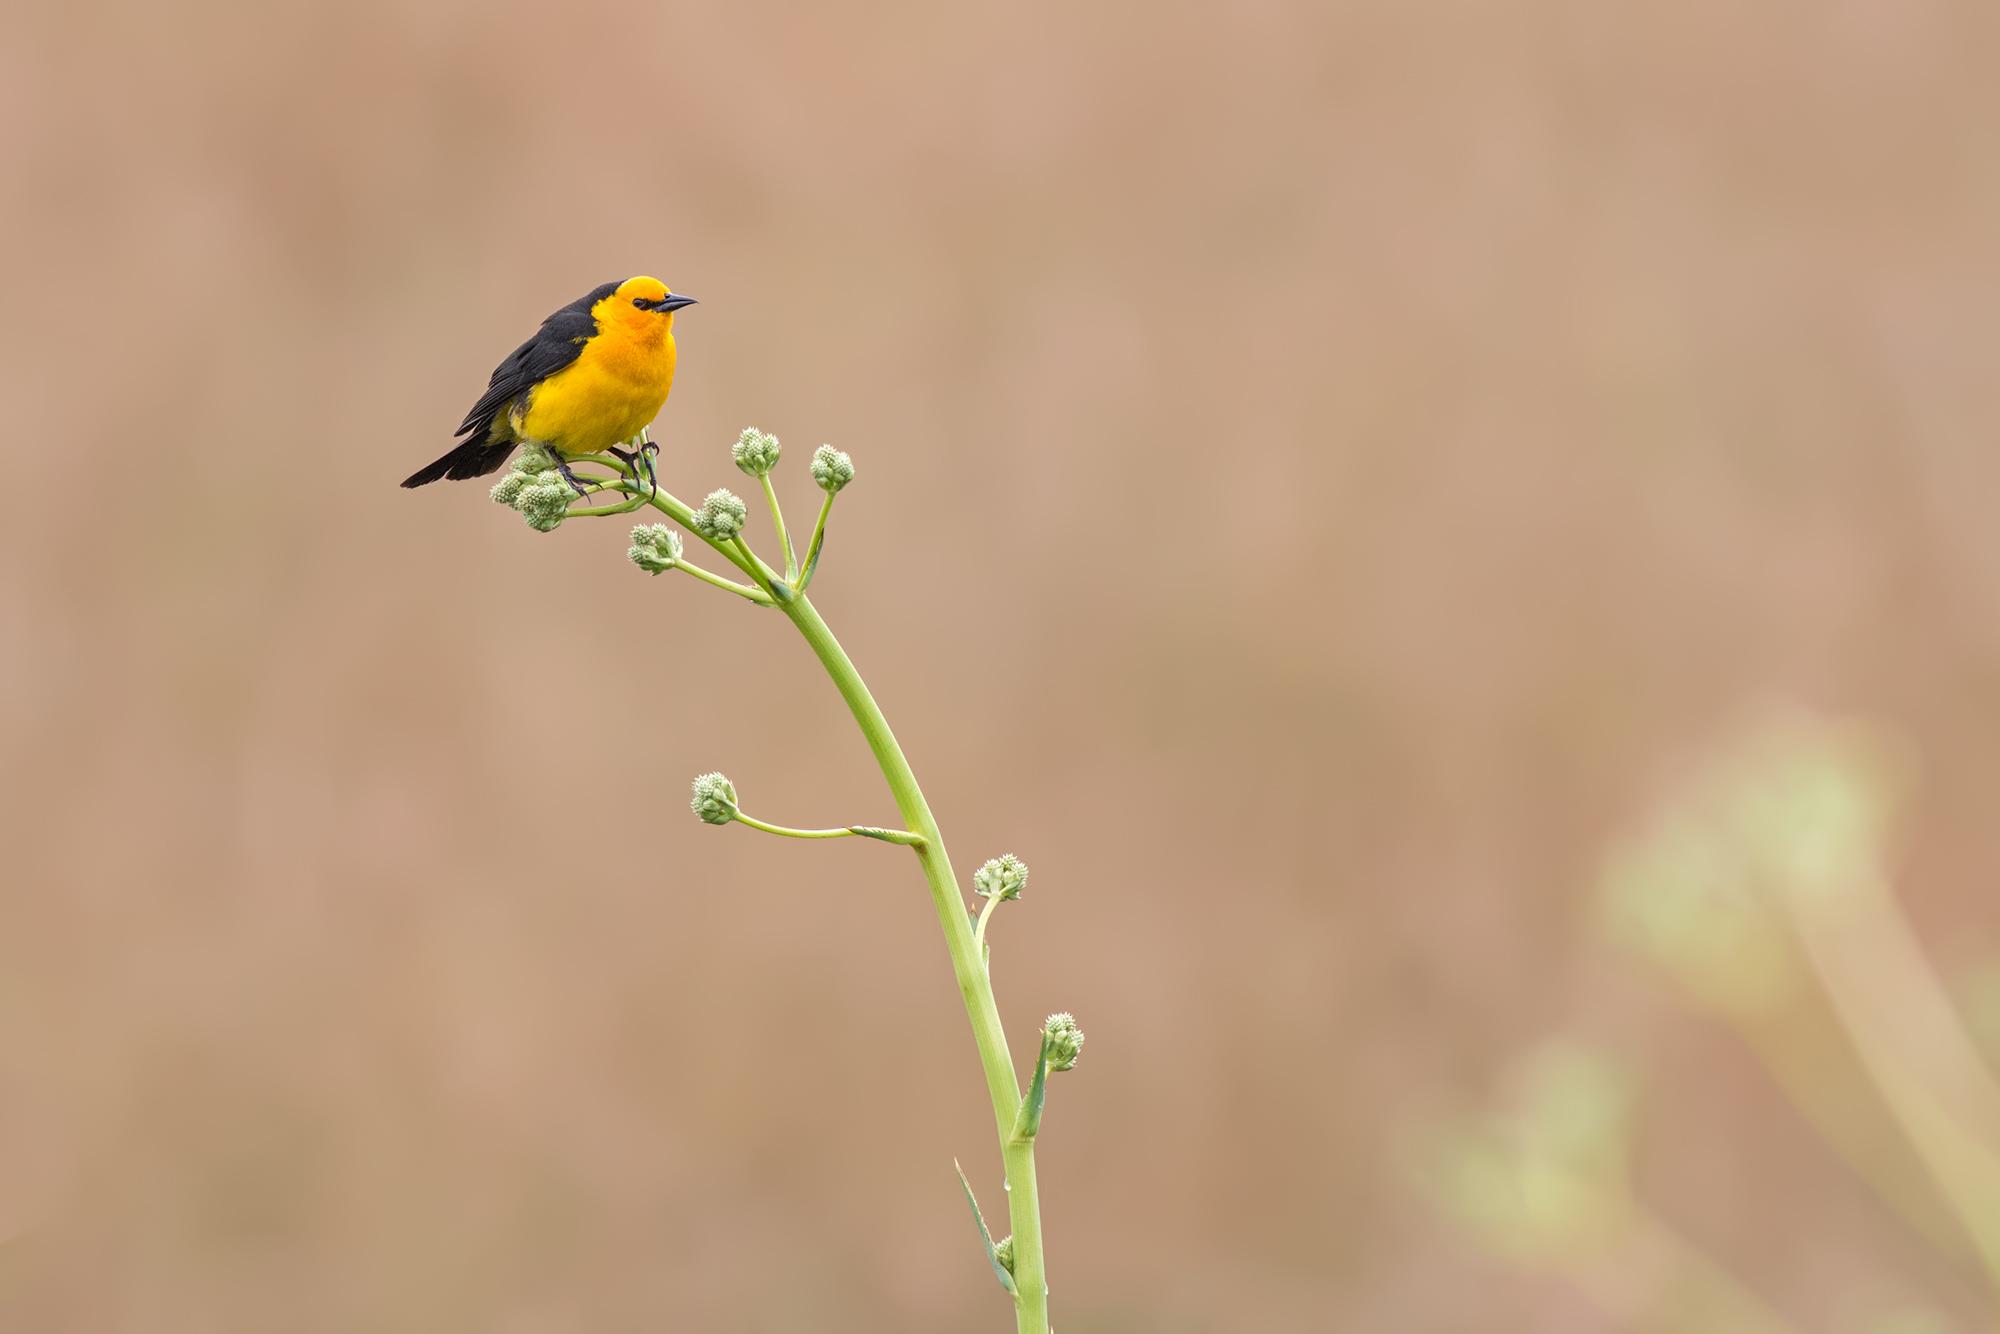 Safron-cowled-Blackbird-JPEG_web 2.jpg